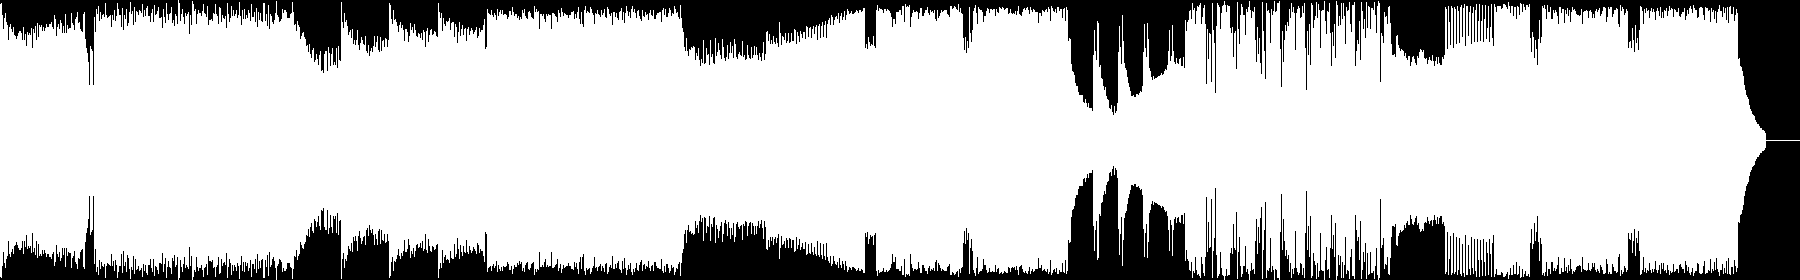 Gravity 2 - Liquid DnB audio waveform